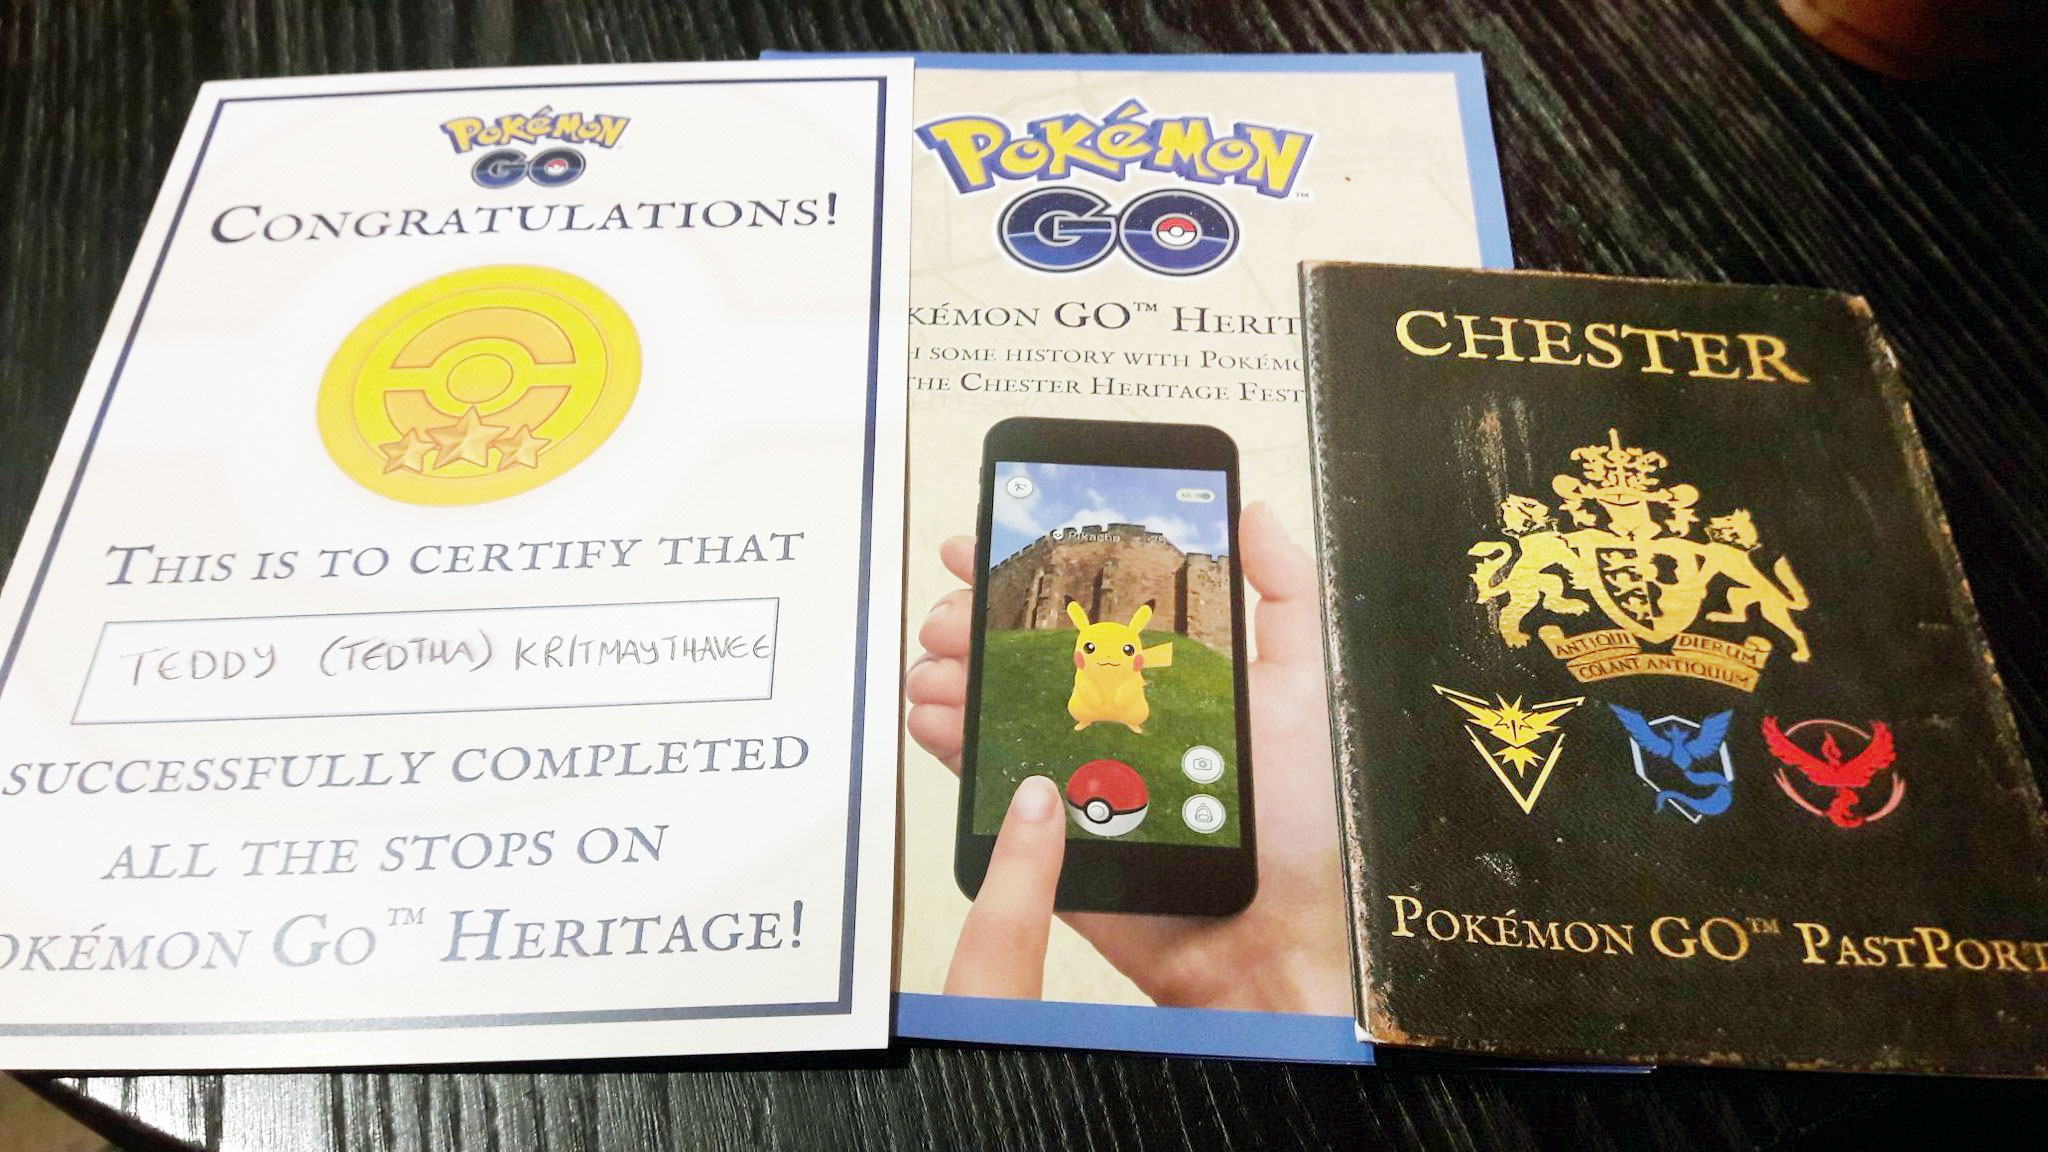 I Pokémon Leggendari aumentano a dismisura le entrate di Pokémon GO